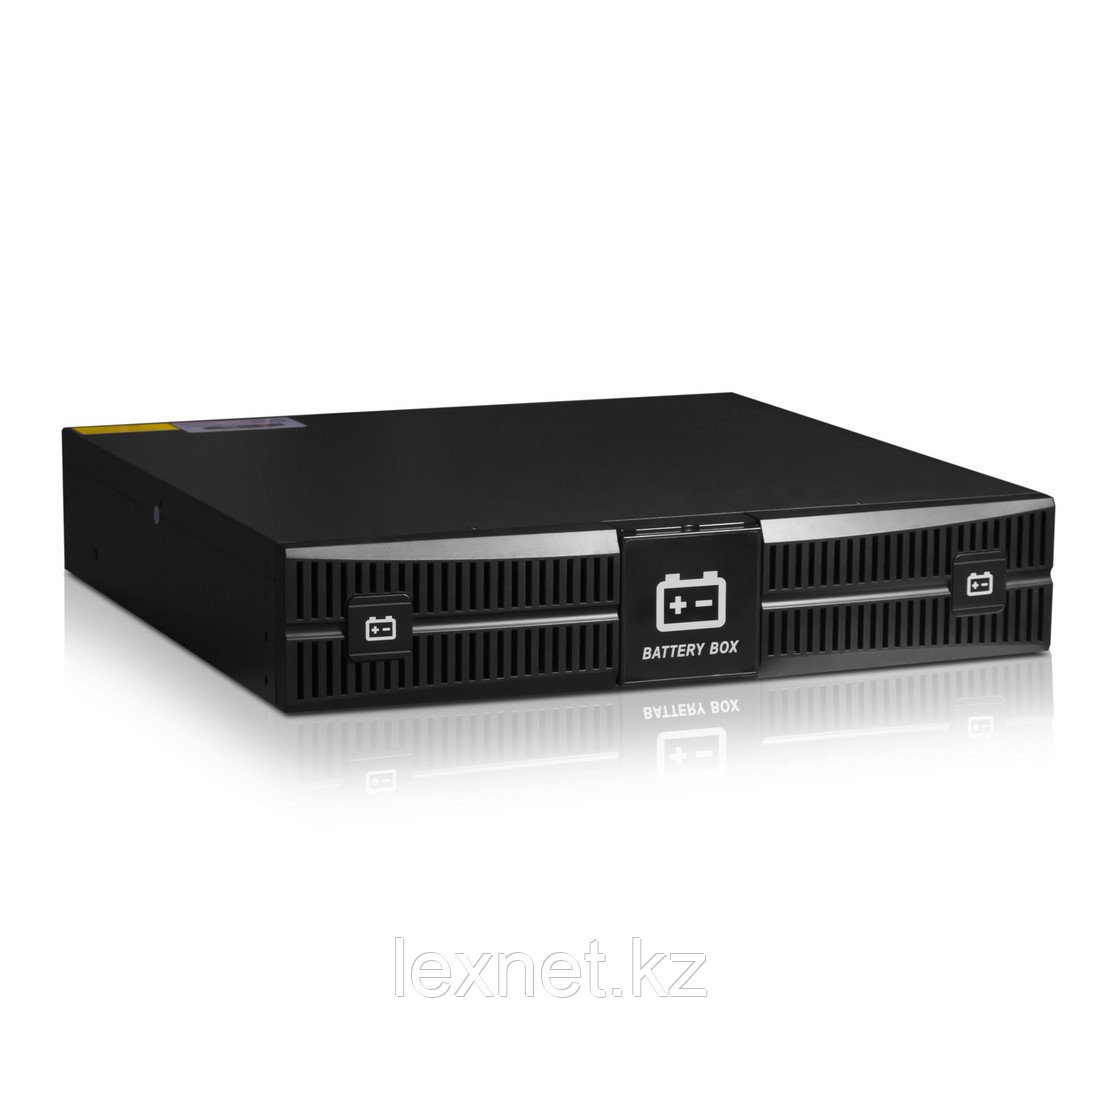 Батарейный блок для ИБП RT-2KL-LCD